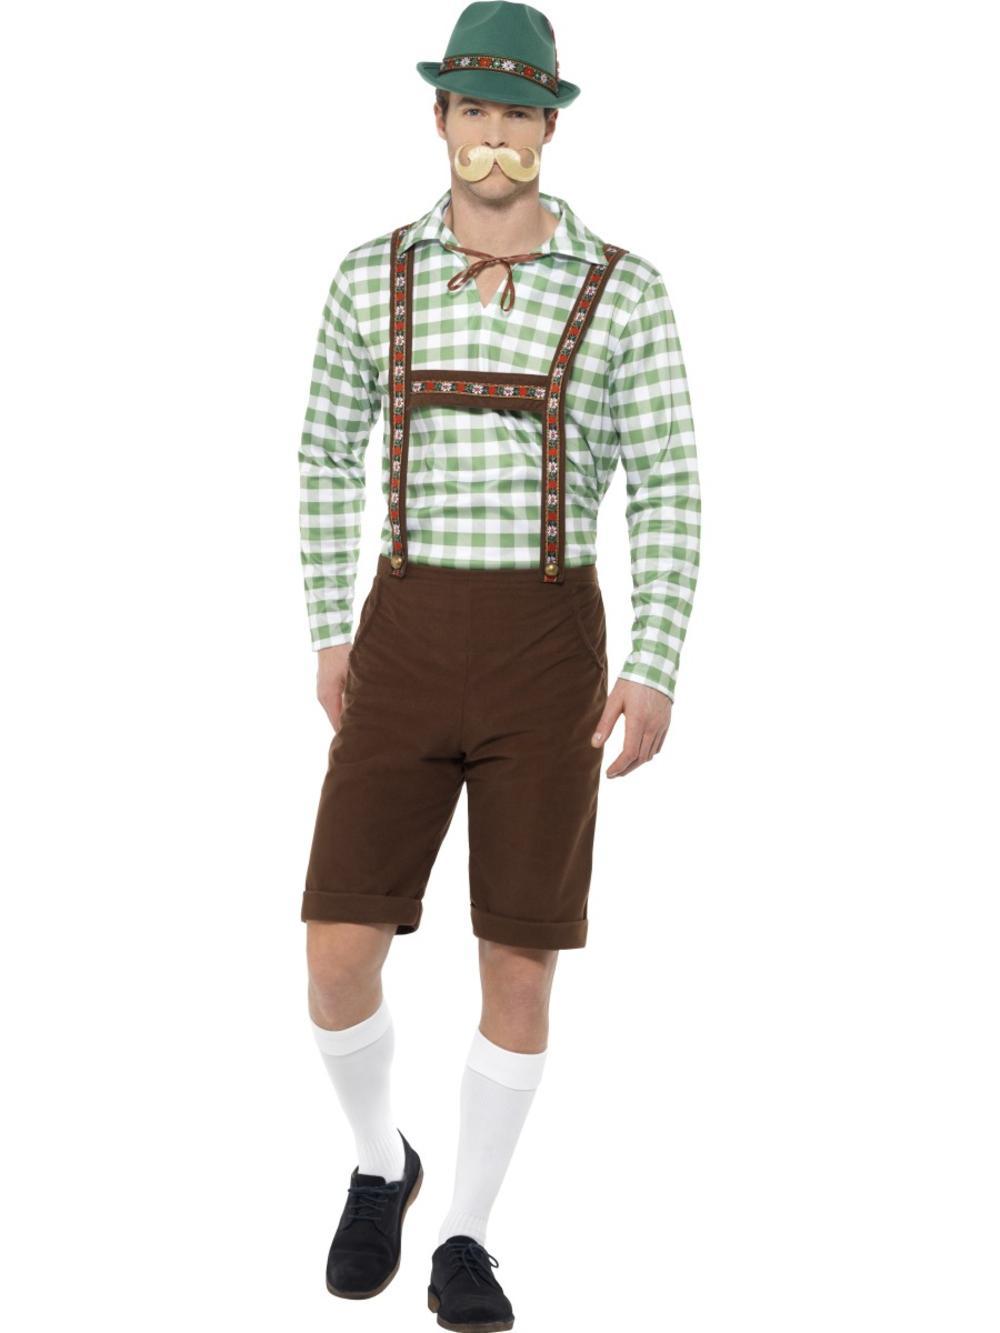 Alpine Bavarian Mens Fancy Dress Oktoberfest German Lederhosen Adults Costume